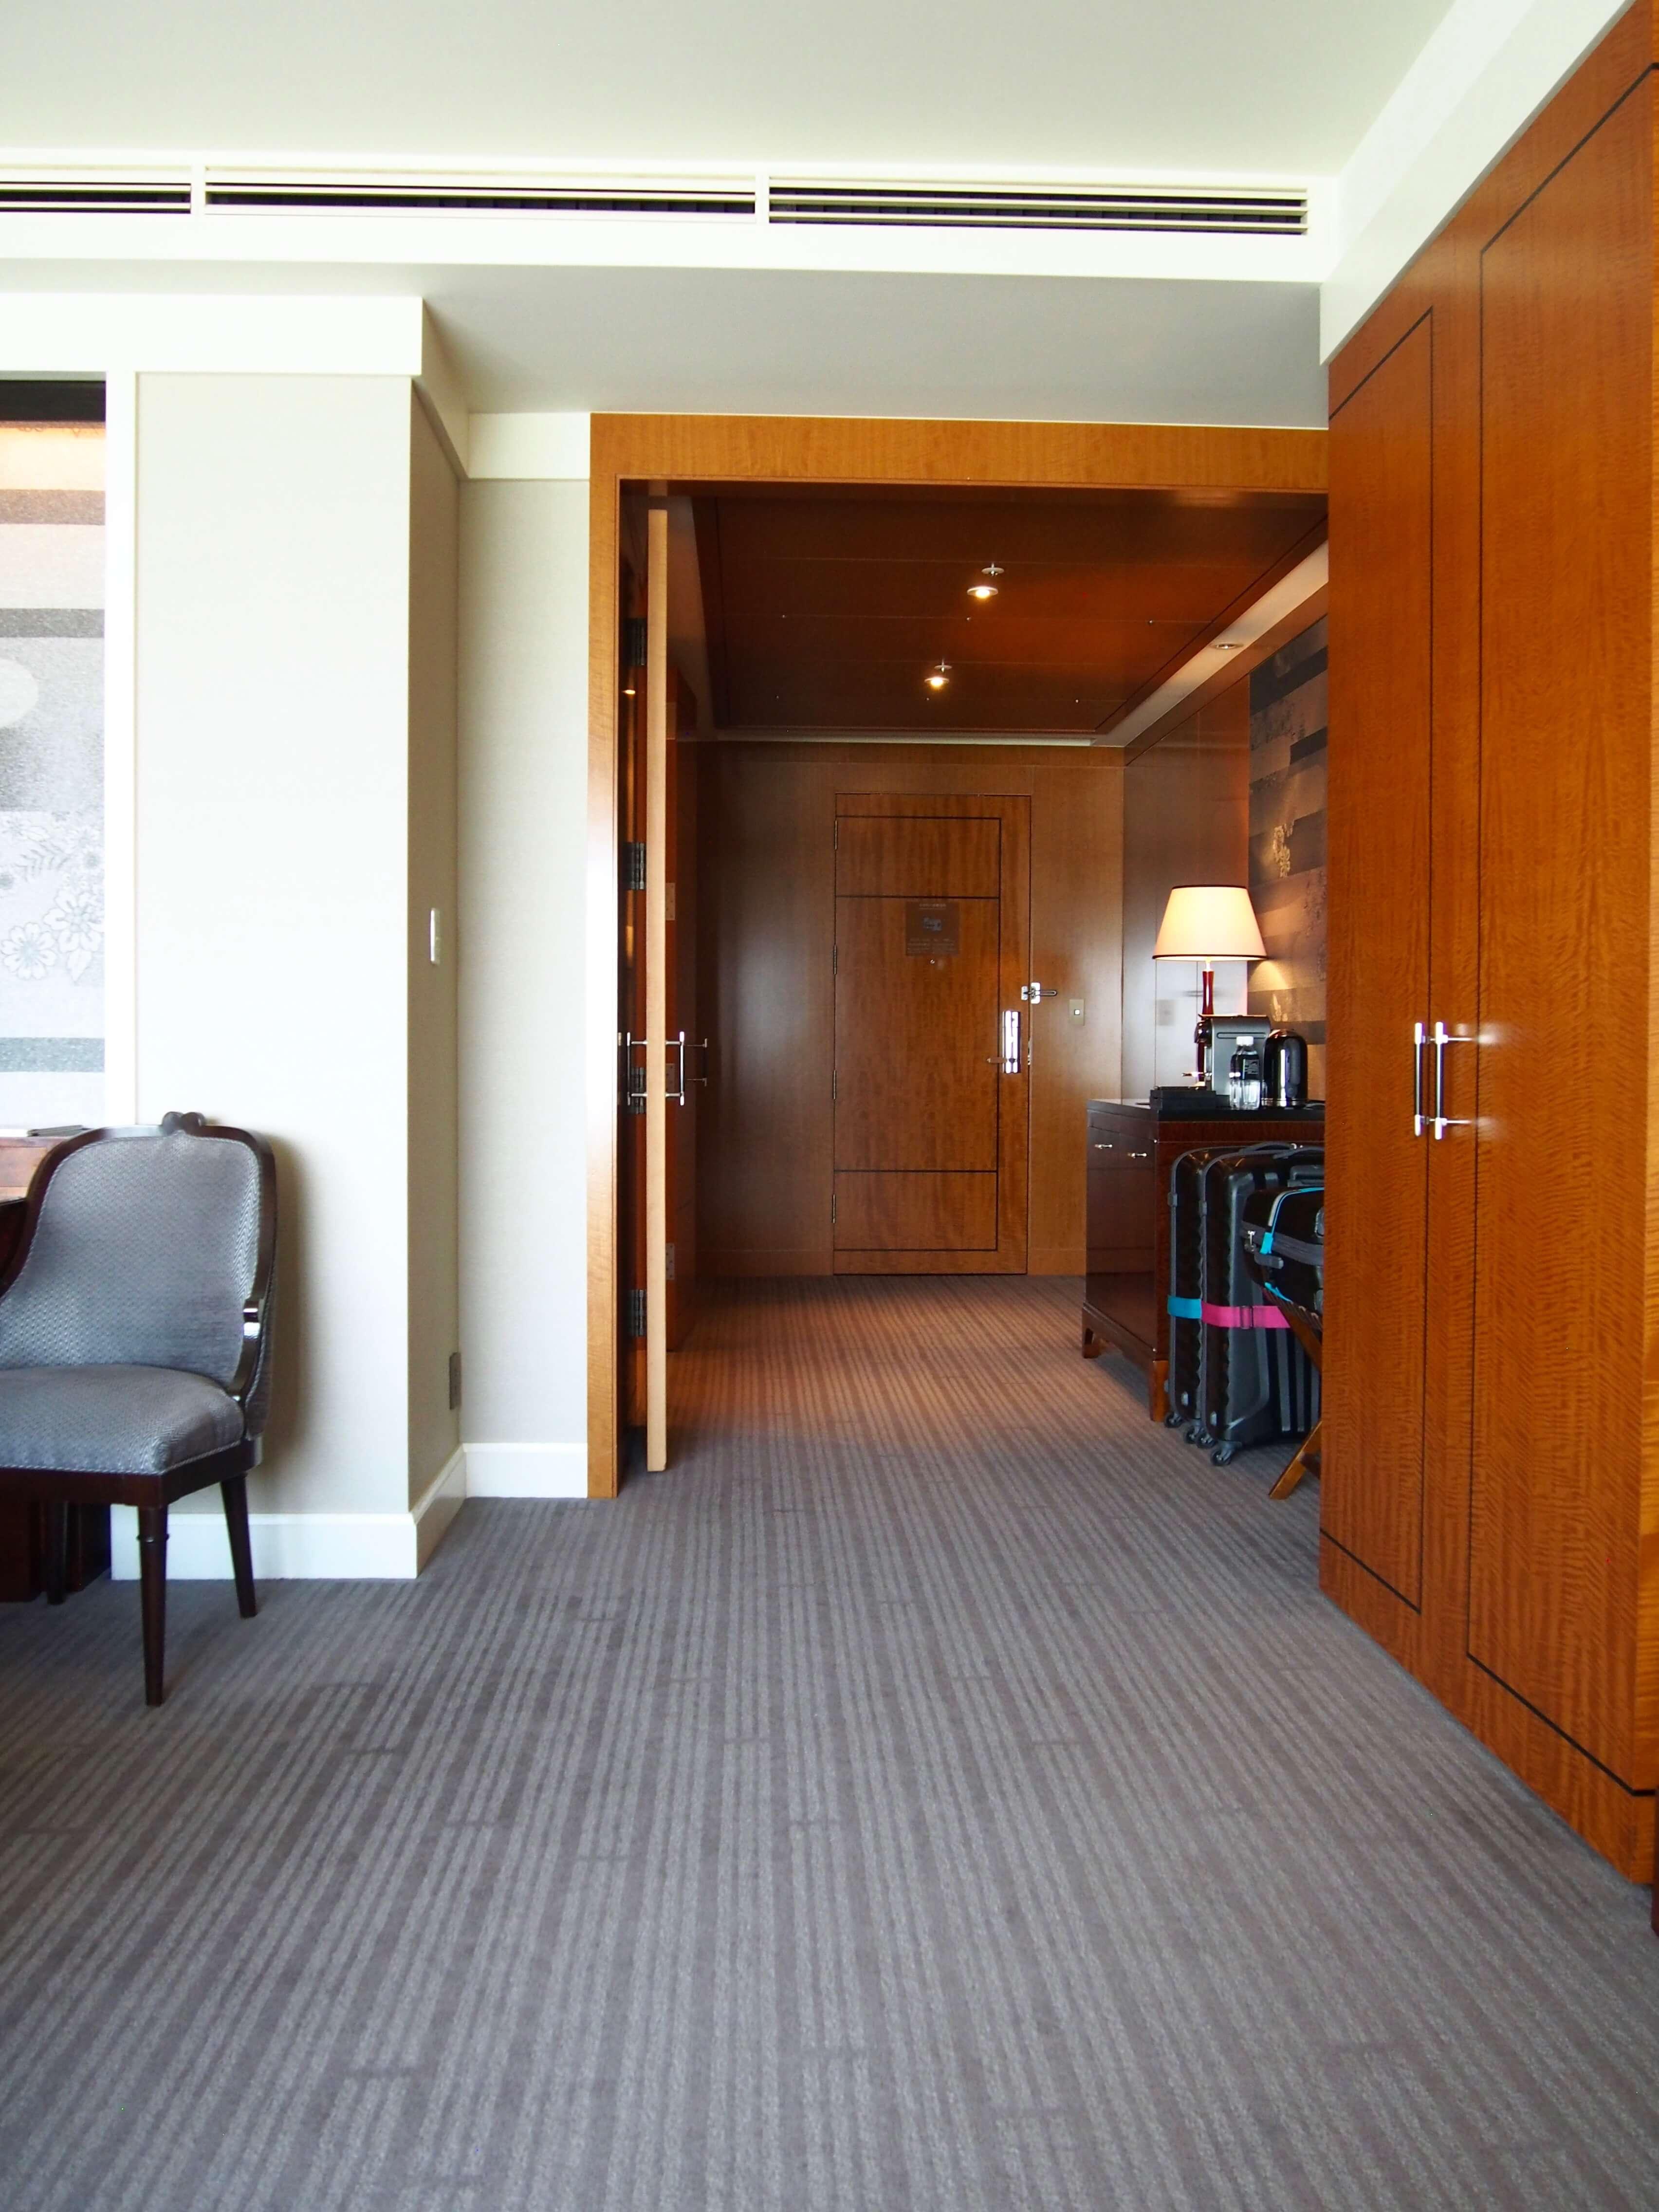 Ritz-Carlton Tokyo Club Deluxe room